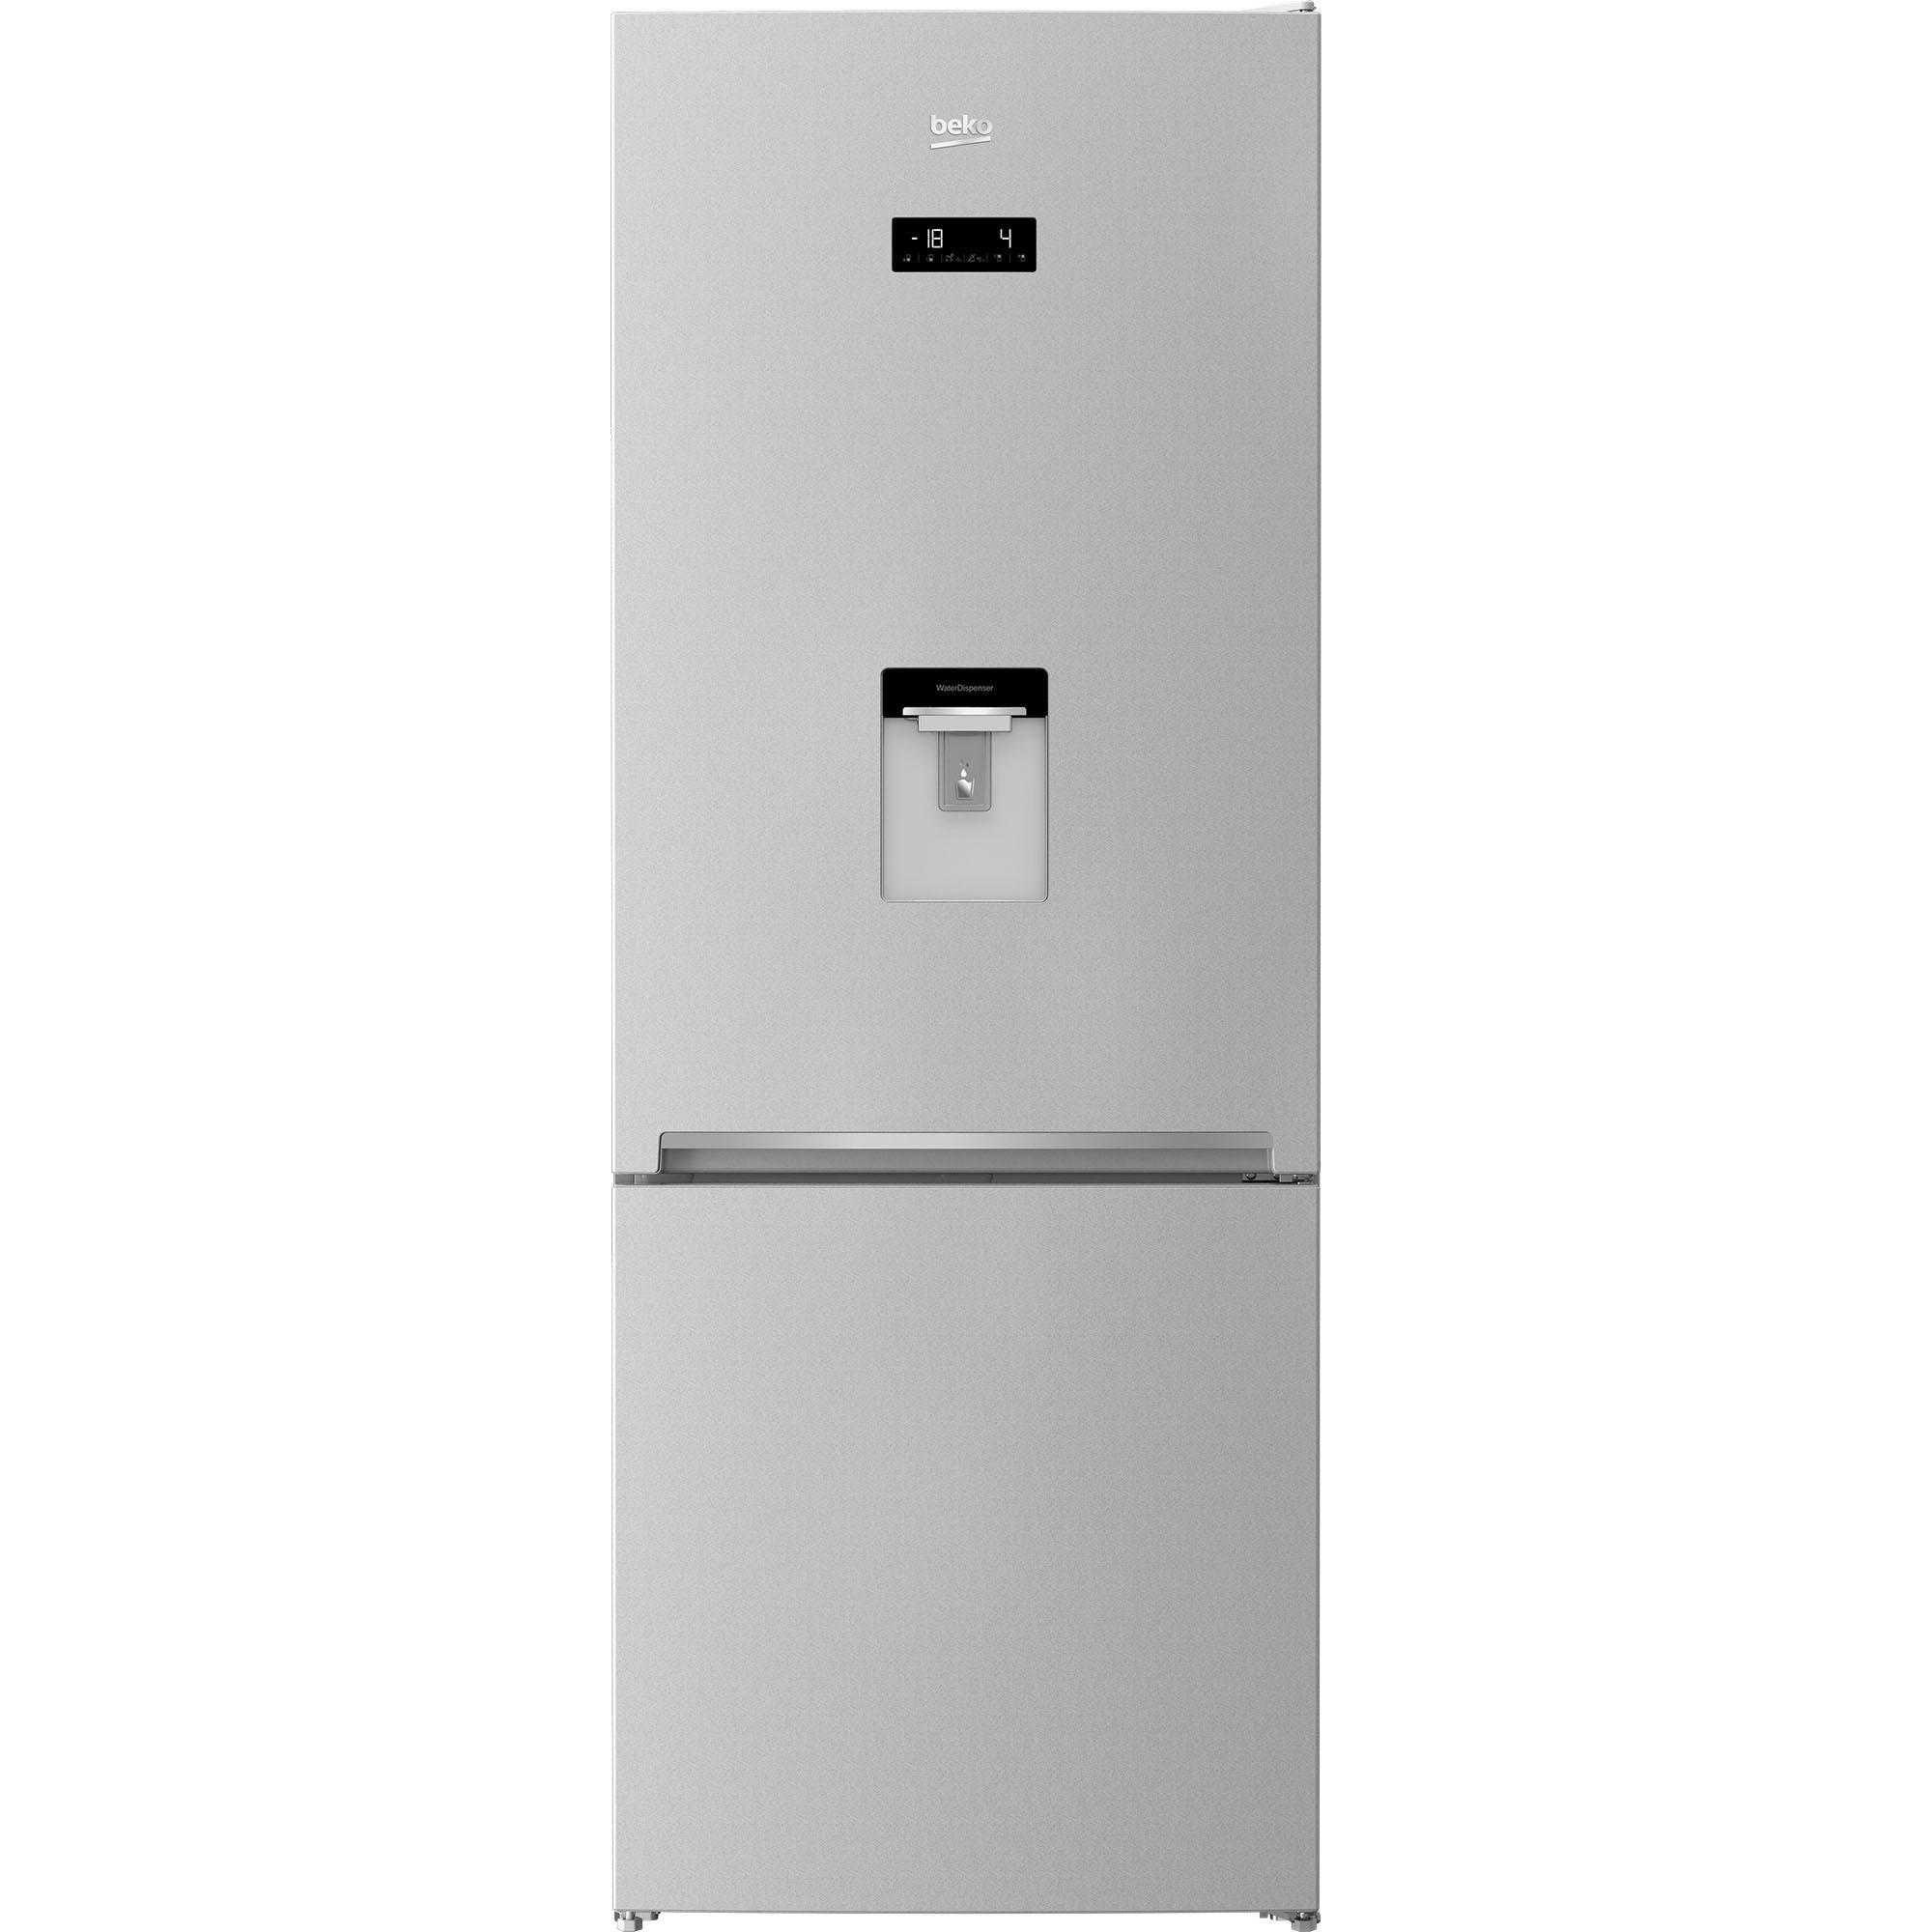 Fotografie Combina frigorifica Beko RCNE560E40DZMN, 497 l, NeoFrost Dual Cooling, HarvestFresh, EverFresh, Dozator de apa, Clasa A++, H 192 cm, Gri Sidef